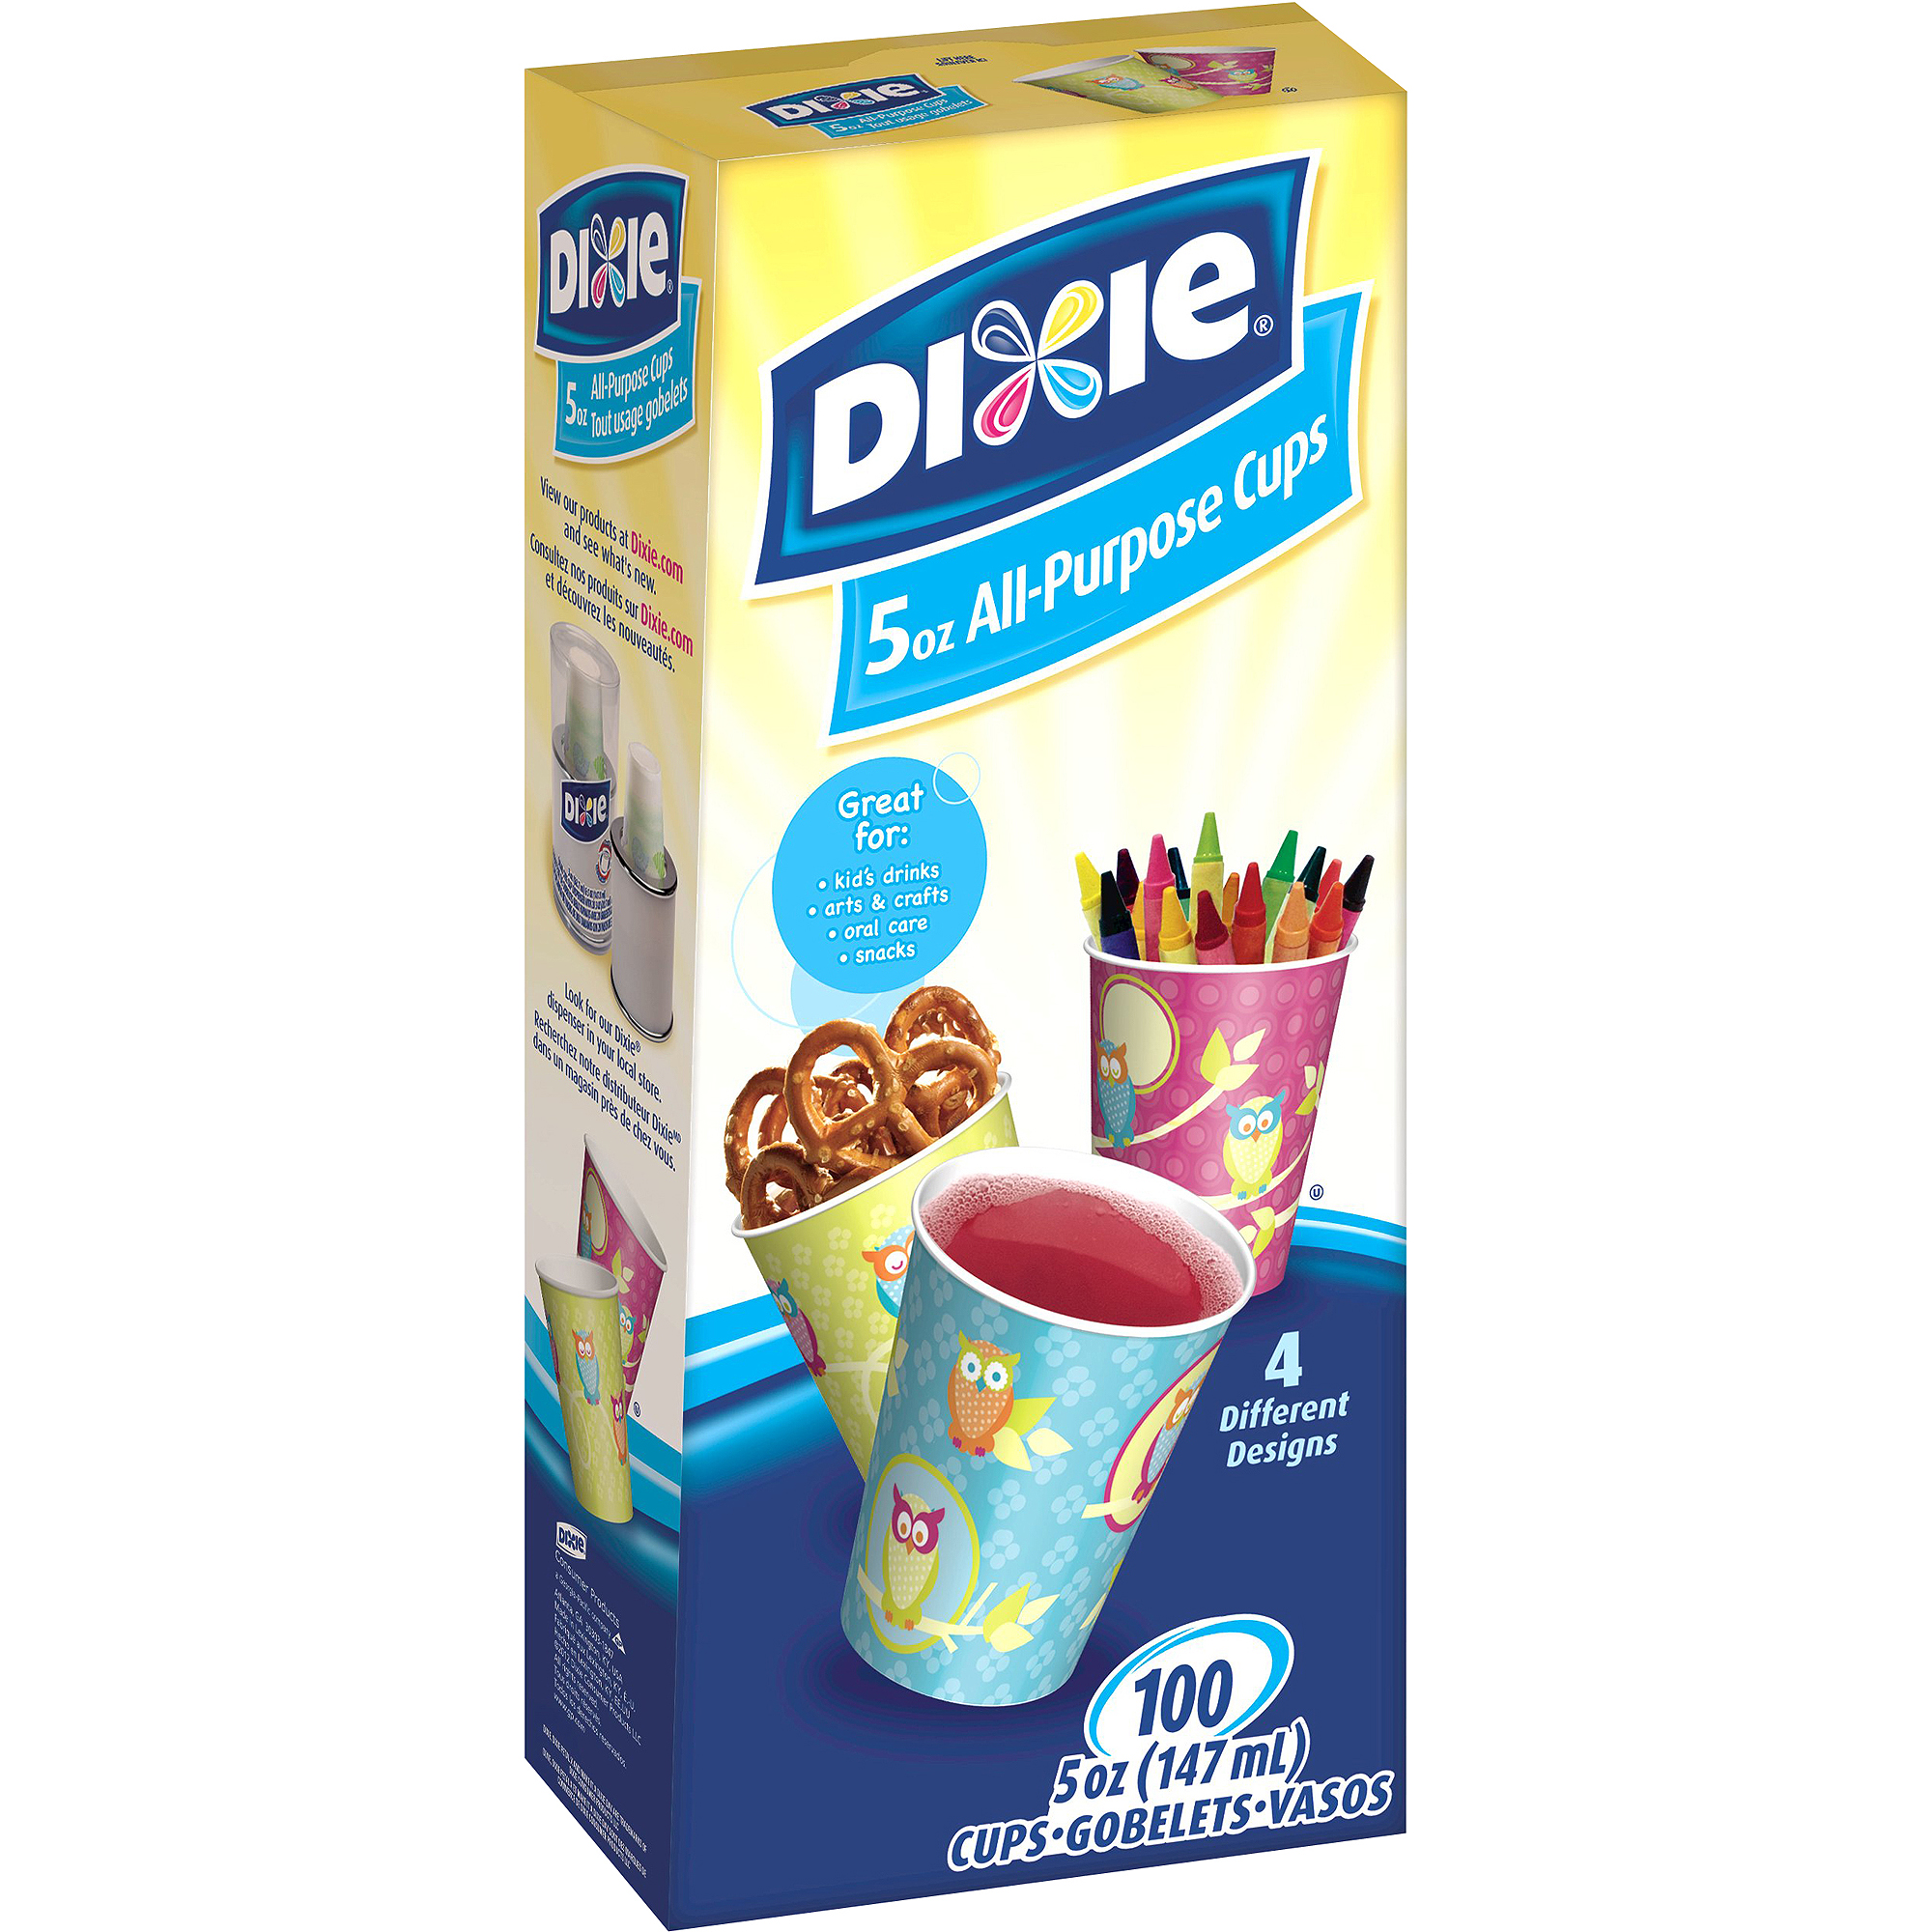 Dixie Bath Cups, 5 oz, 100 count